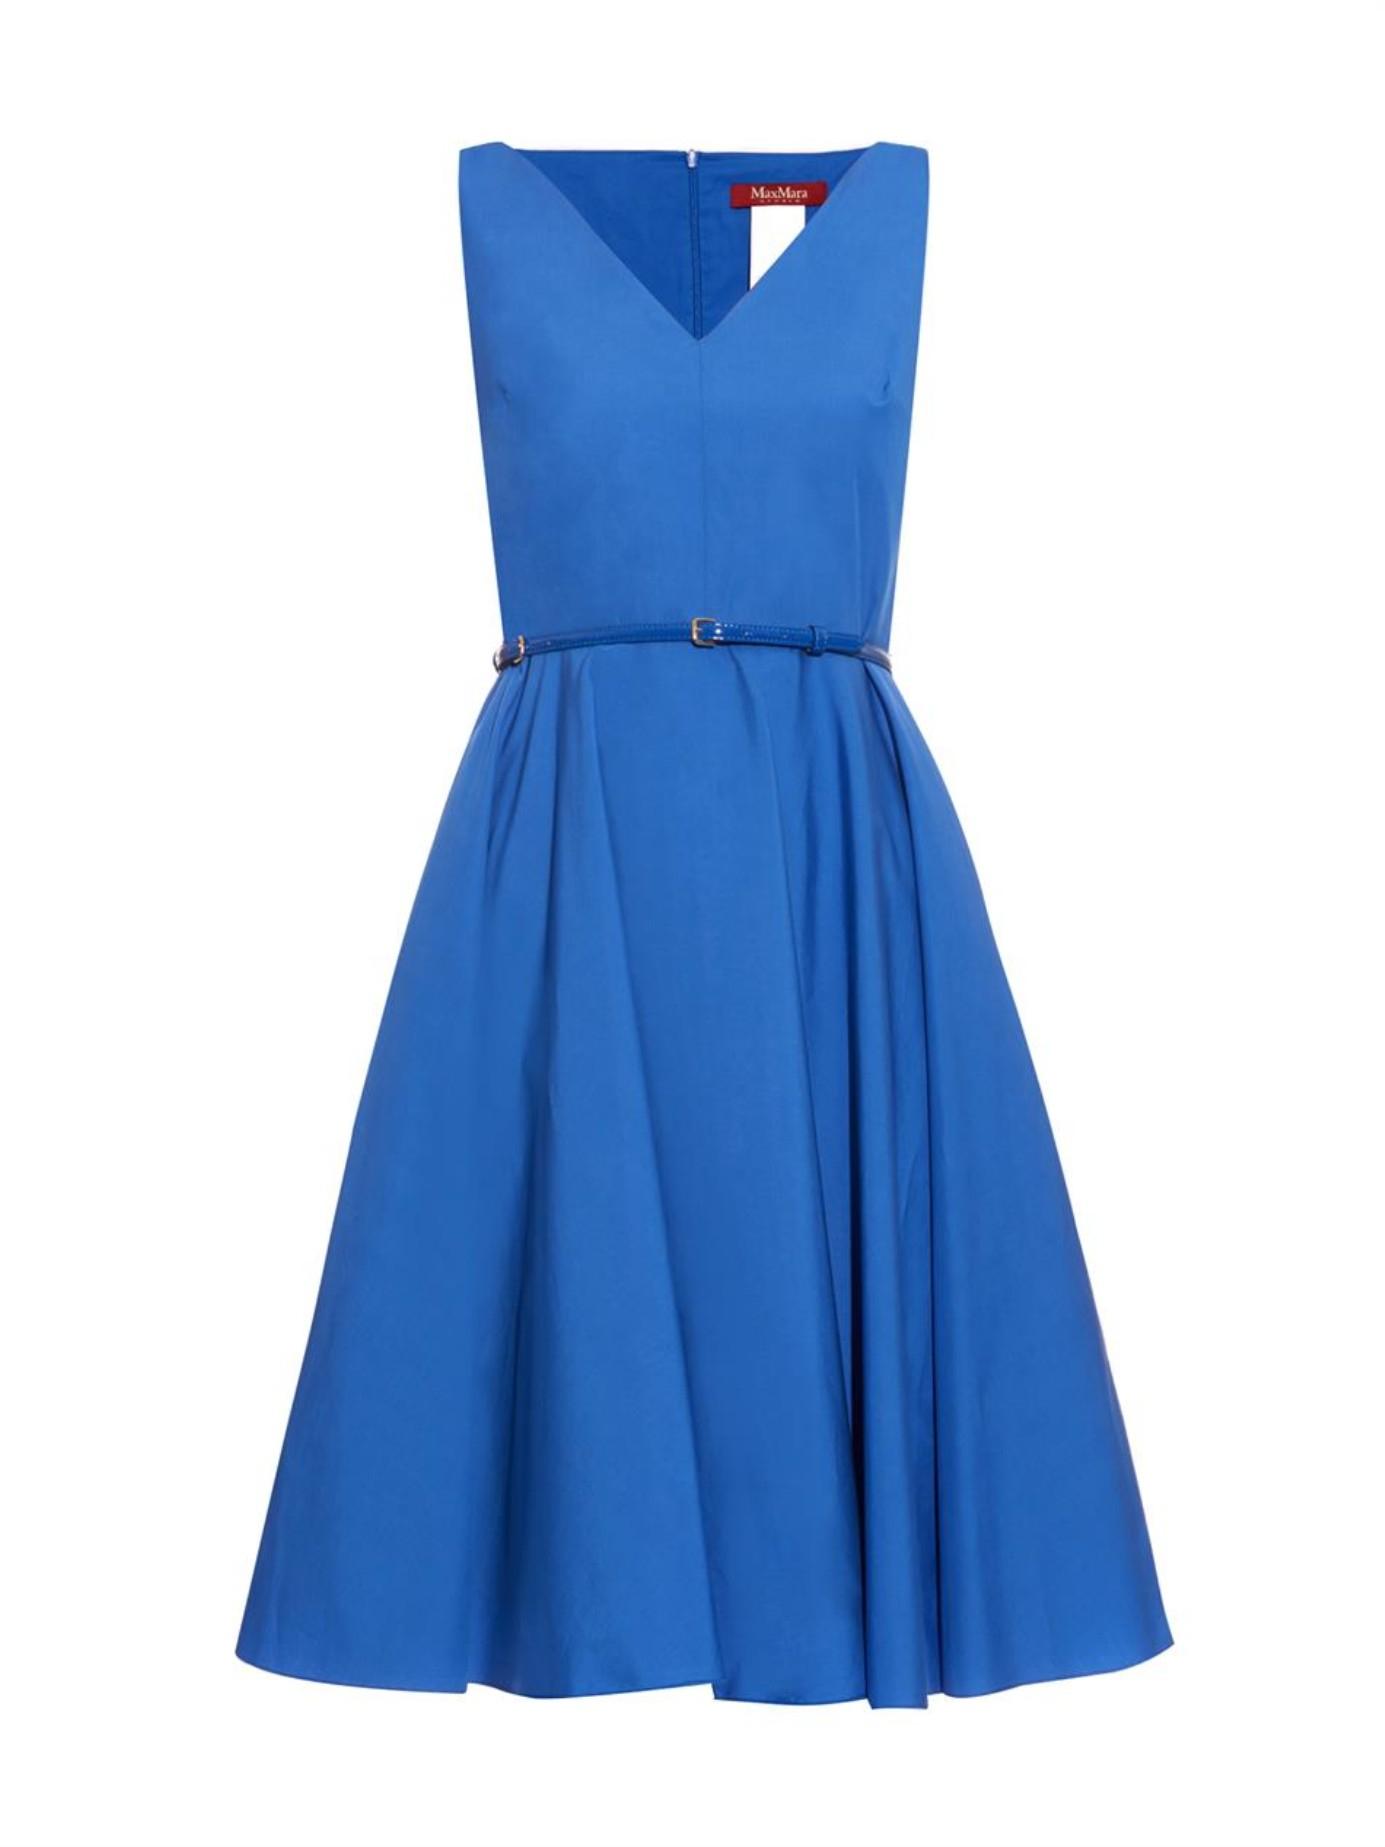 max mara studio asiago dress in blue lyst. Black Bedroom Furniture Sets. Home Design Ideas